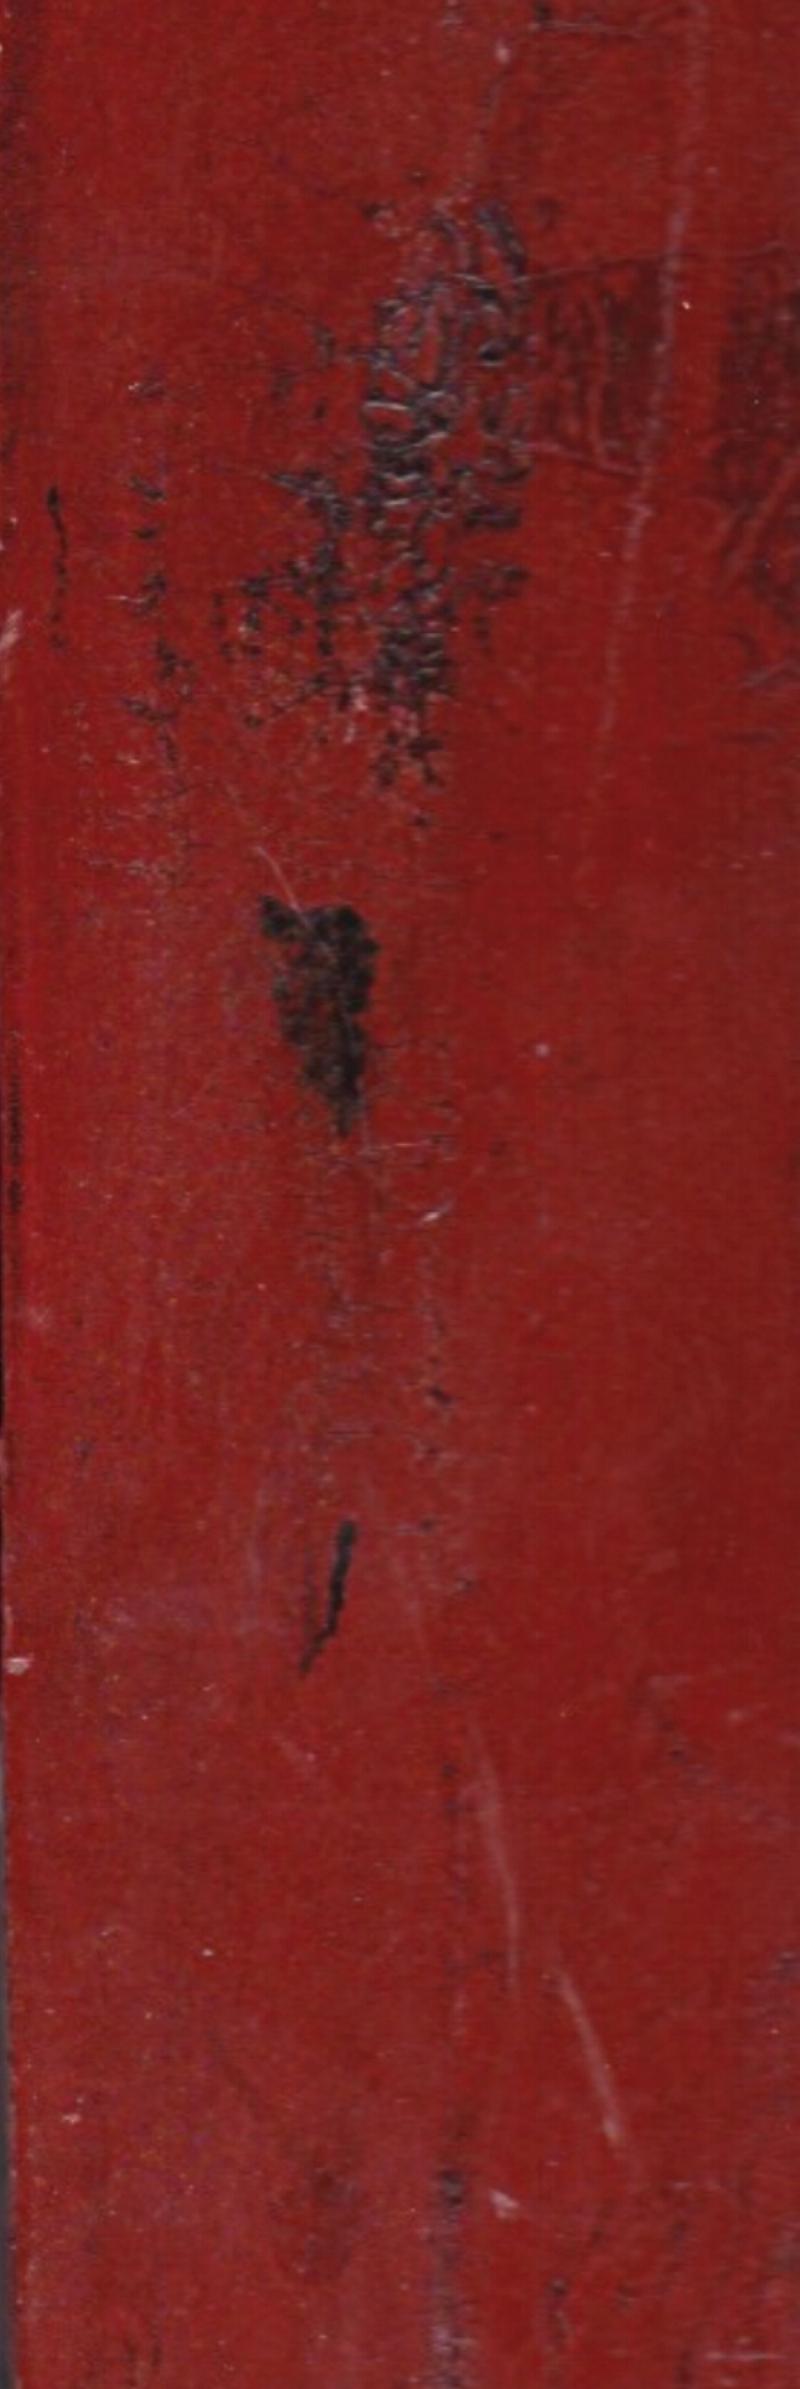 red  dist 4.jpg